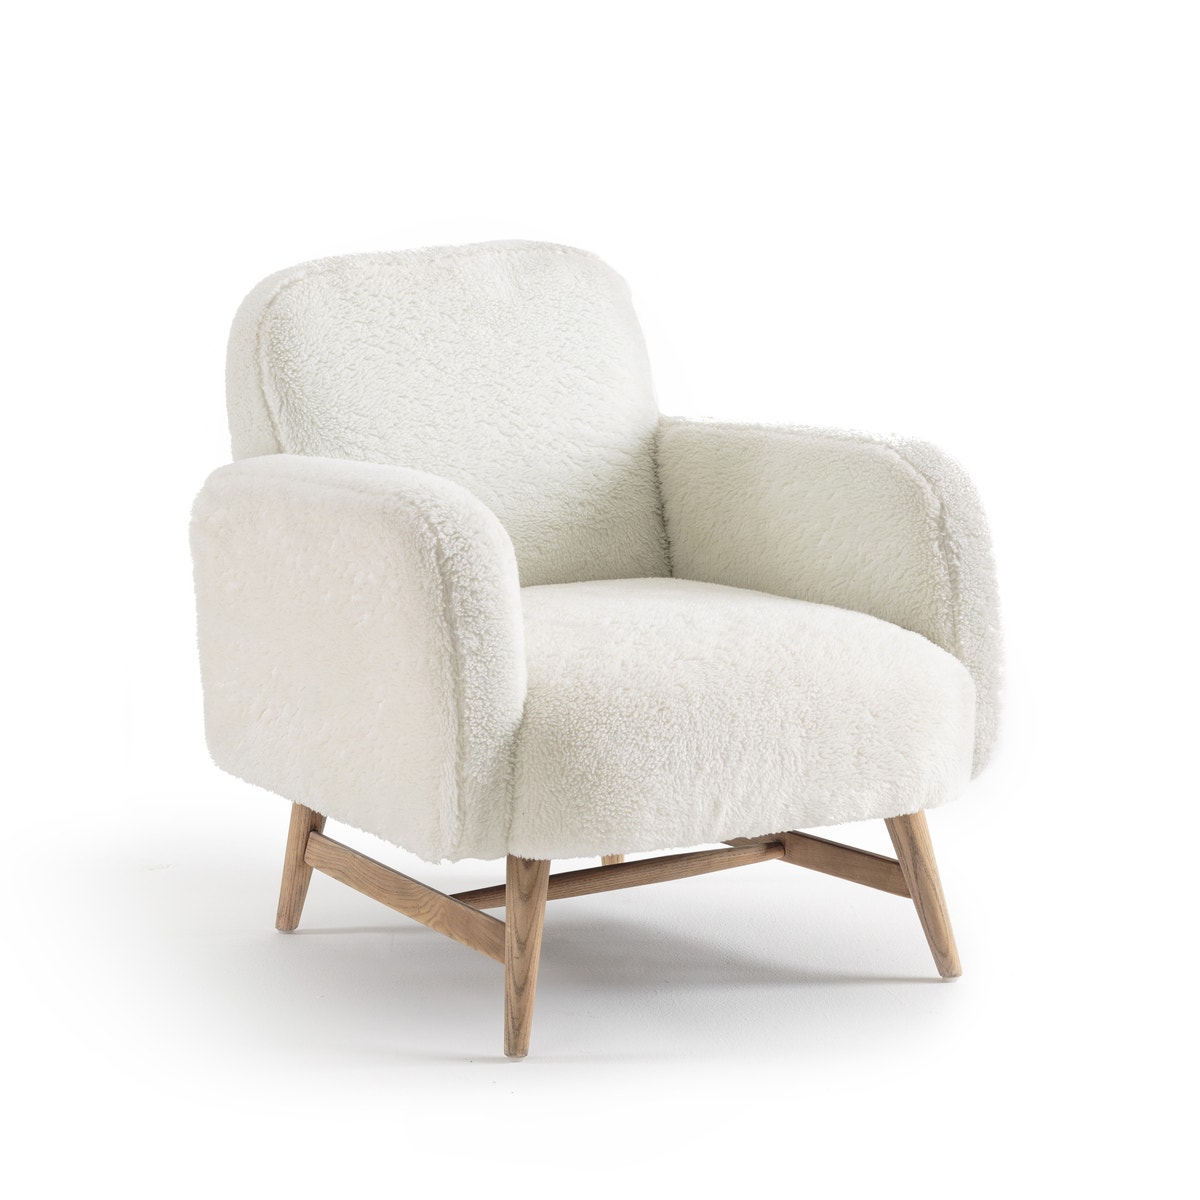 Cody faux fur armchair, design E.Gallina